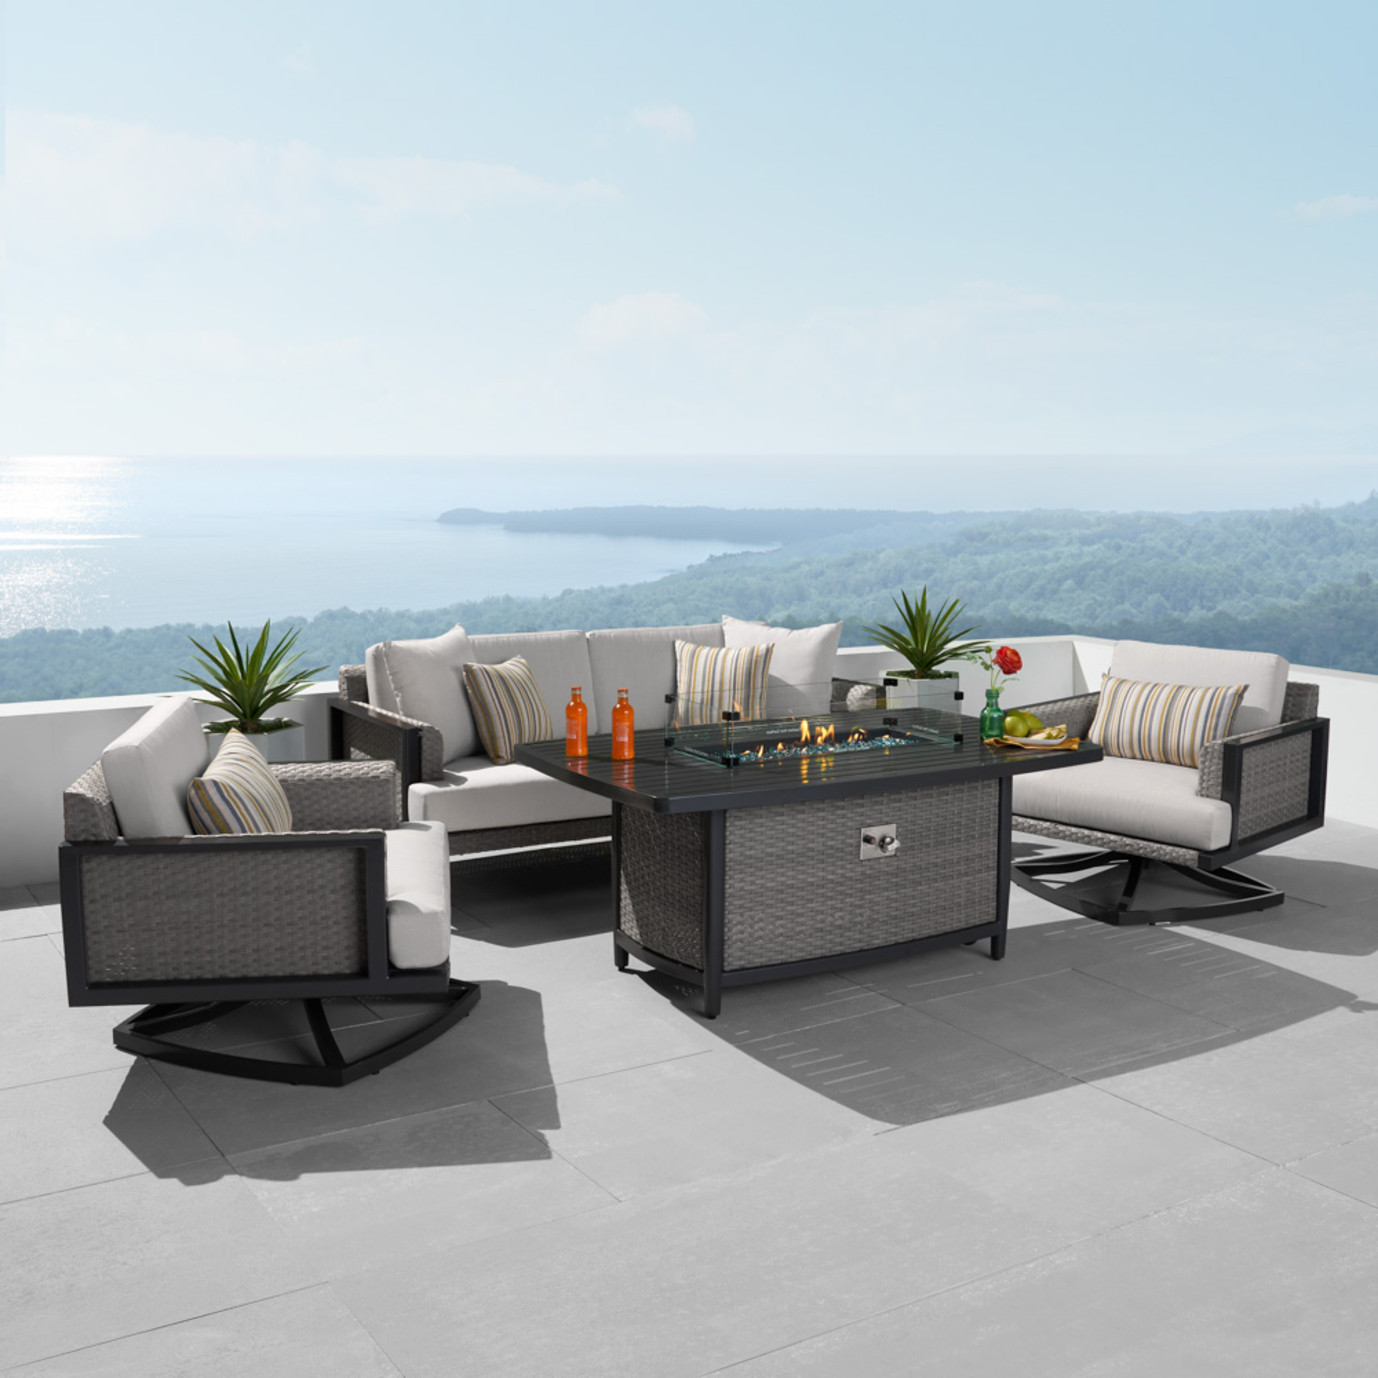 Vistano® 4 Piece Fire Conversation Seating Set